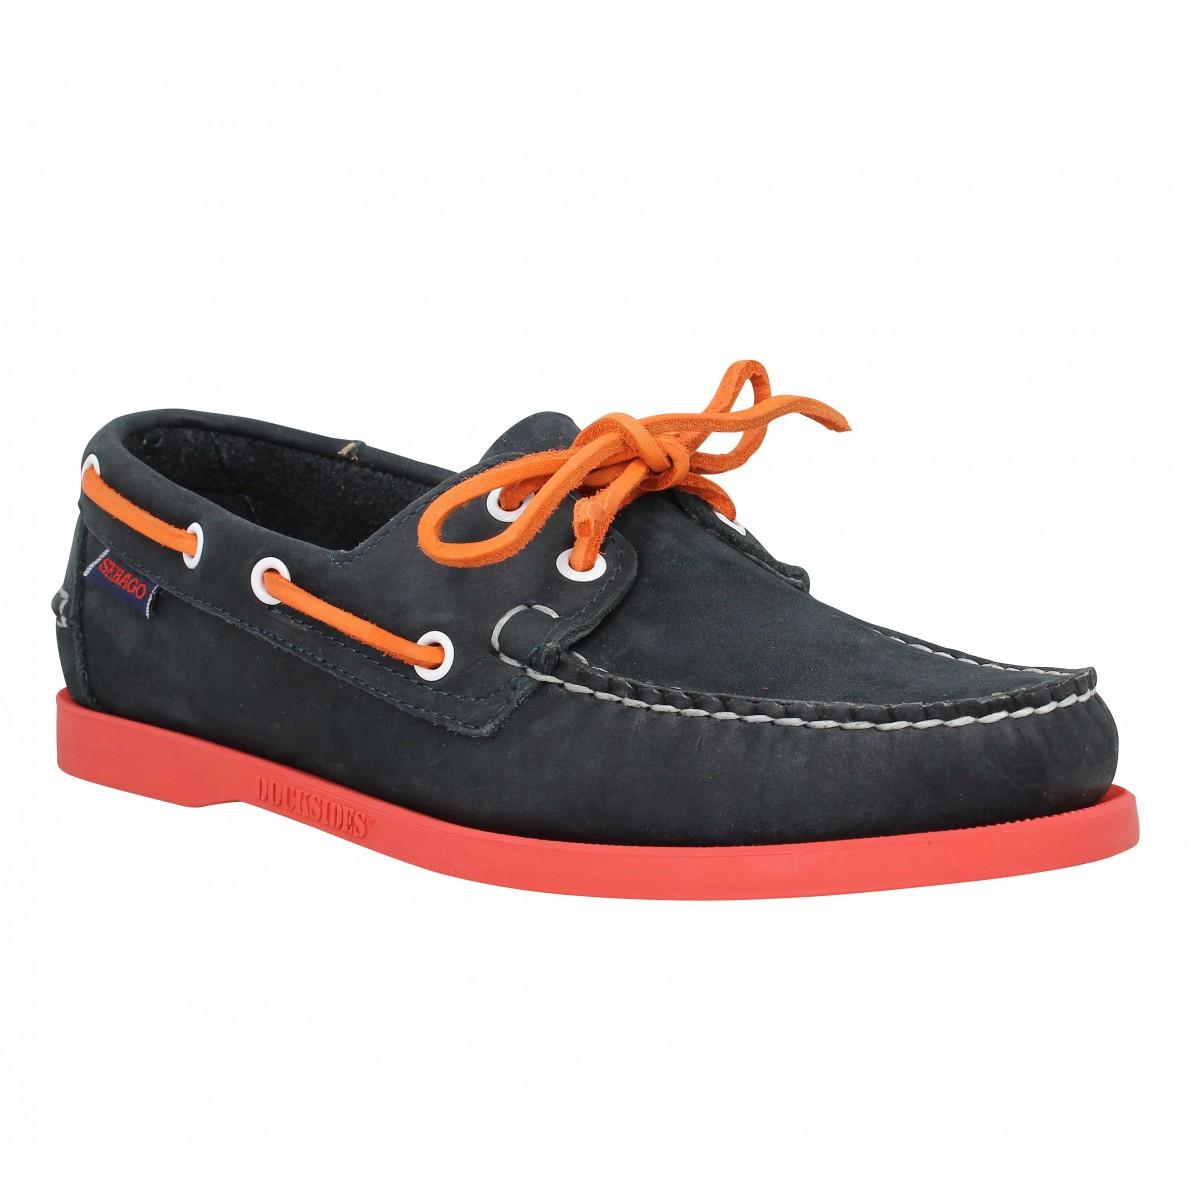 Chaussures bateaux SEBAGO Docksides velours Homme Marine + Rouge